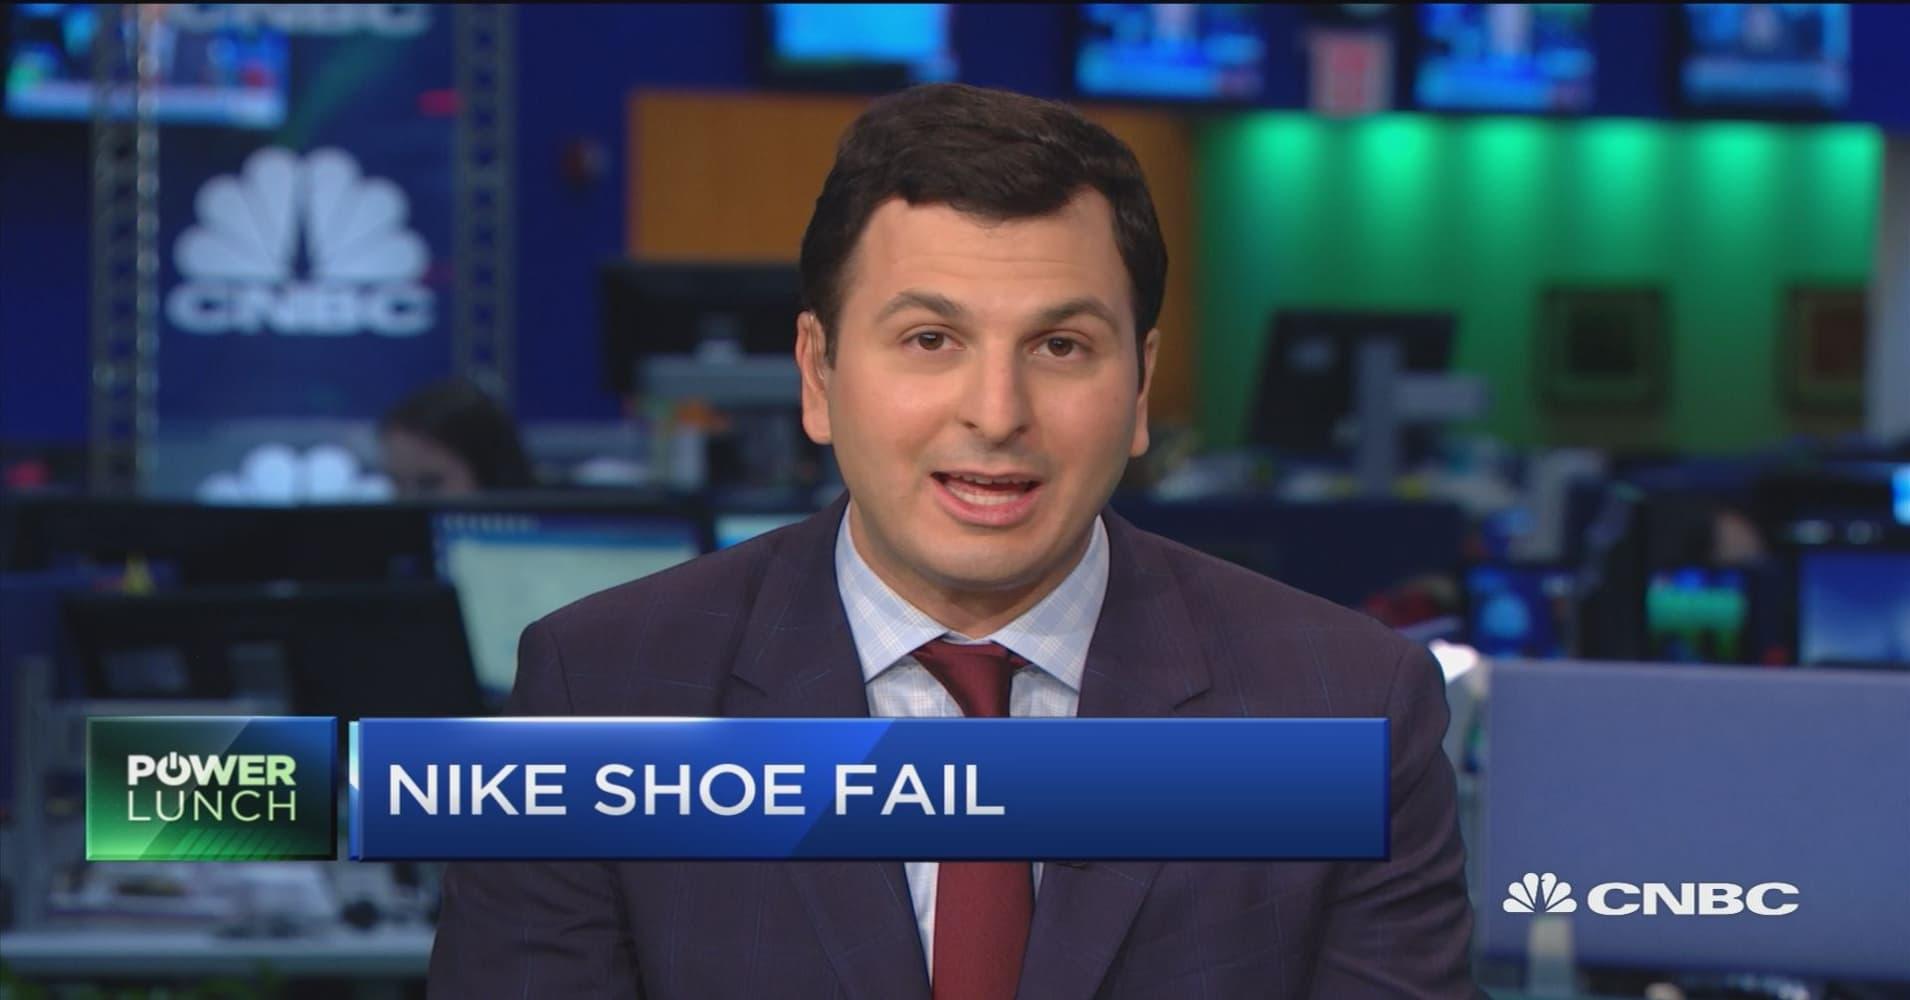 c5237ec1285 Nike shares down after Zion Williamson s shoe breaks